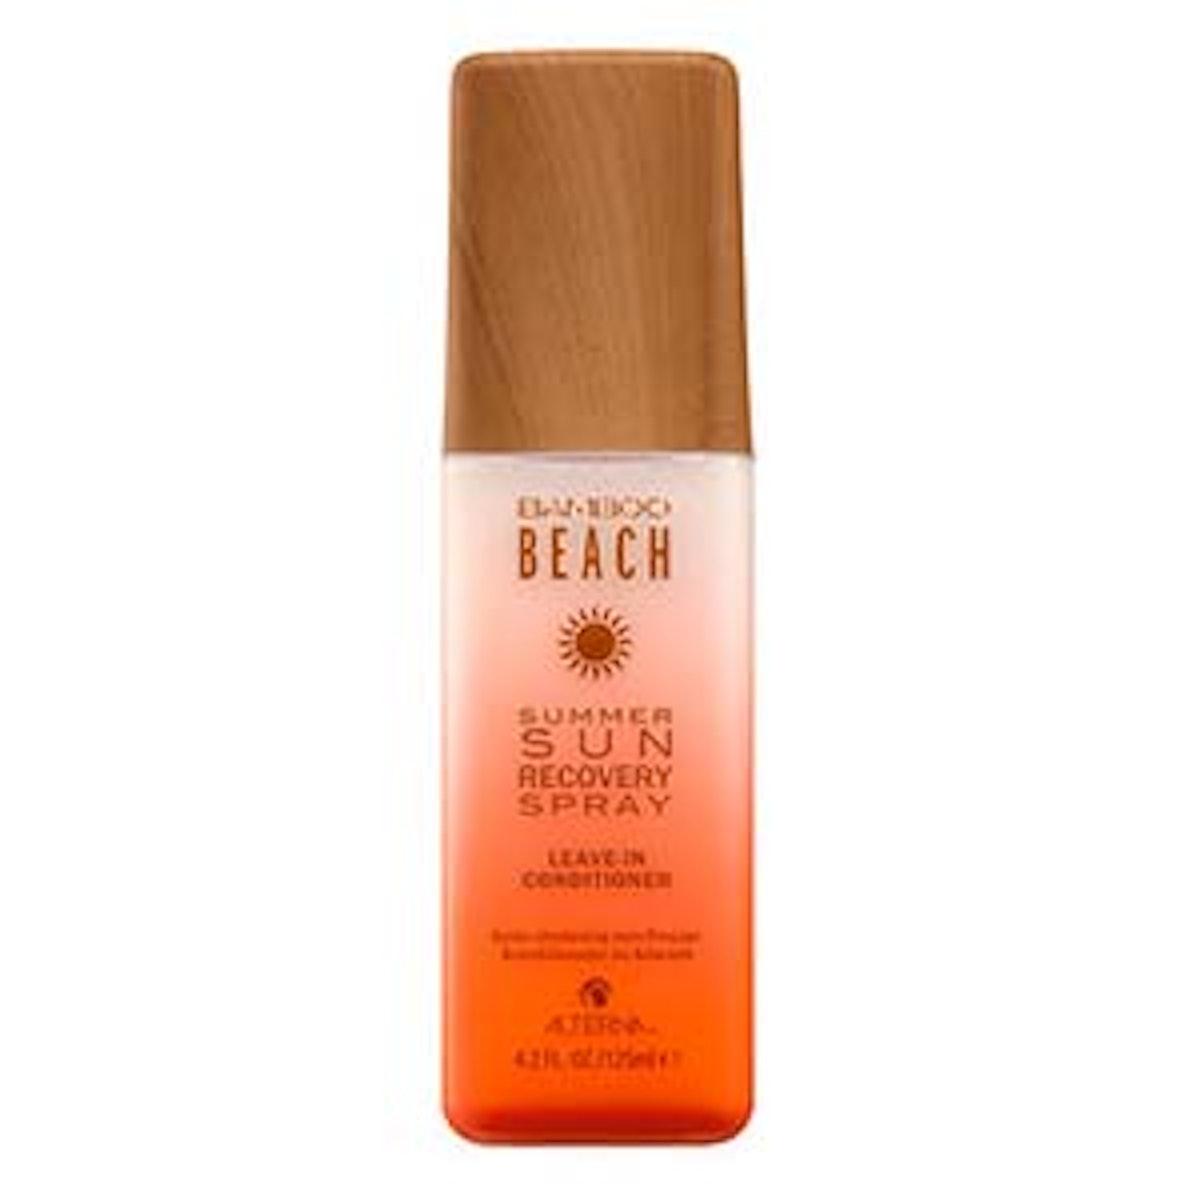 Beach Summer Sun Recovery Spray